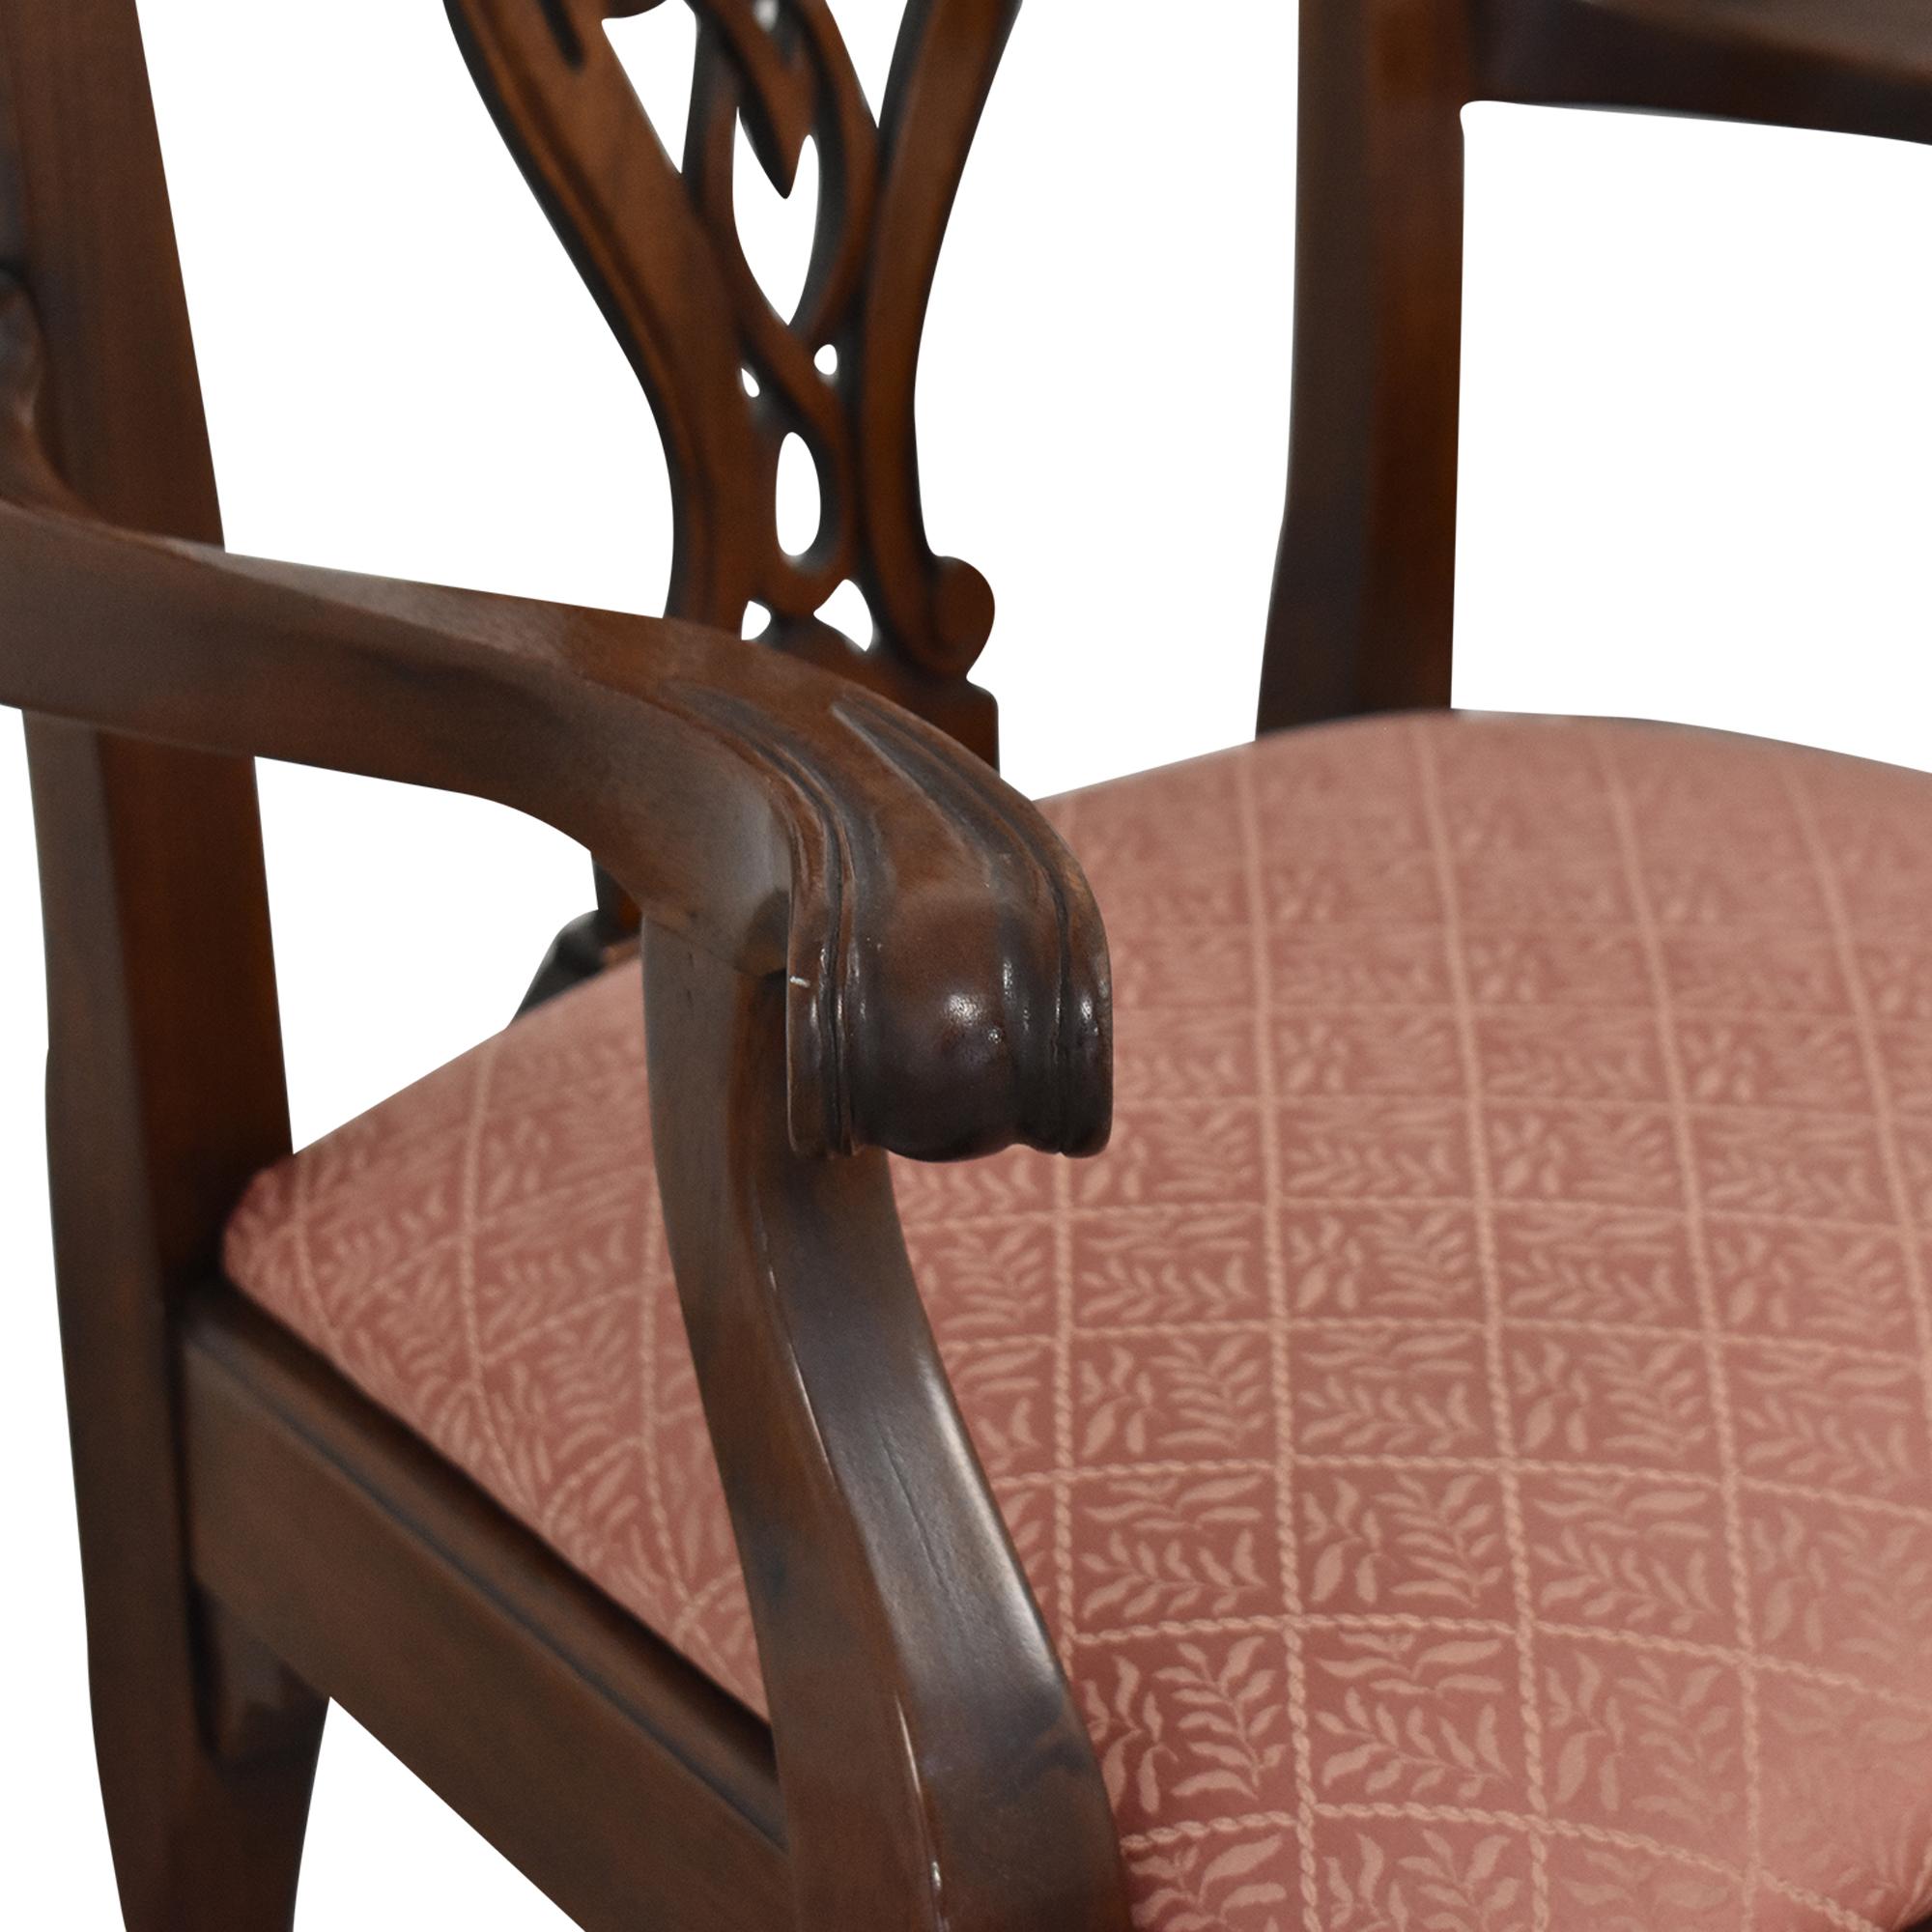 Henredon Furniture Henredon Heirloom Dining Chairs used